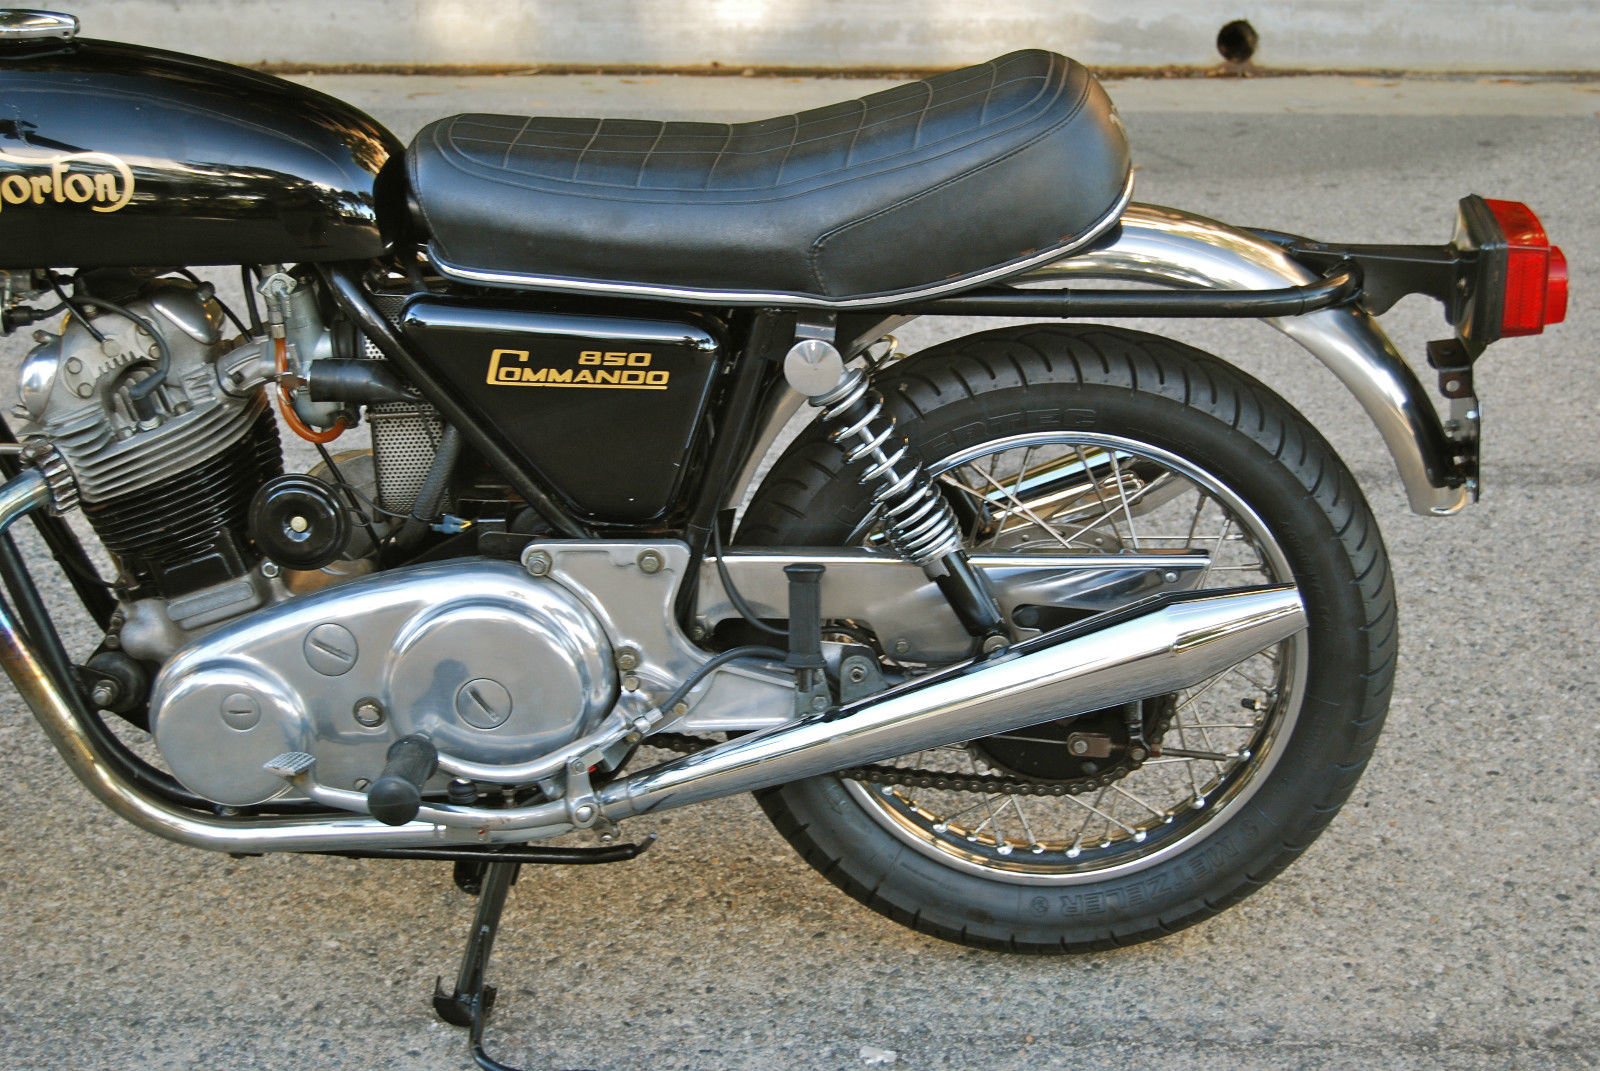 Restored Norton Commando 1974 Photographs At Classic Bikes Restored Bikes Restored